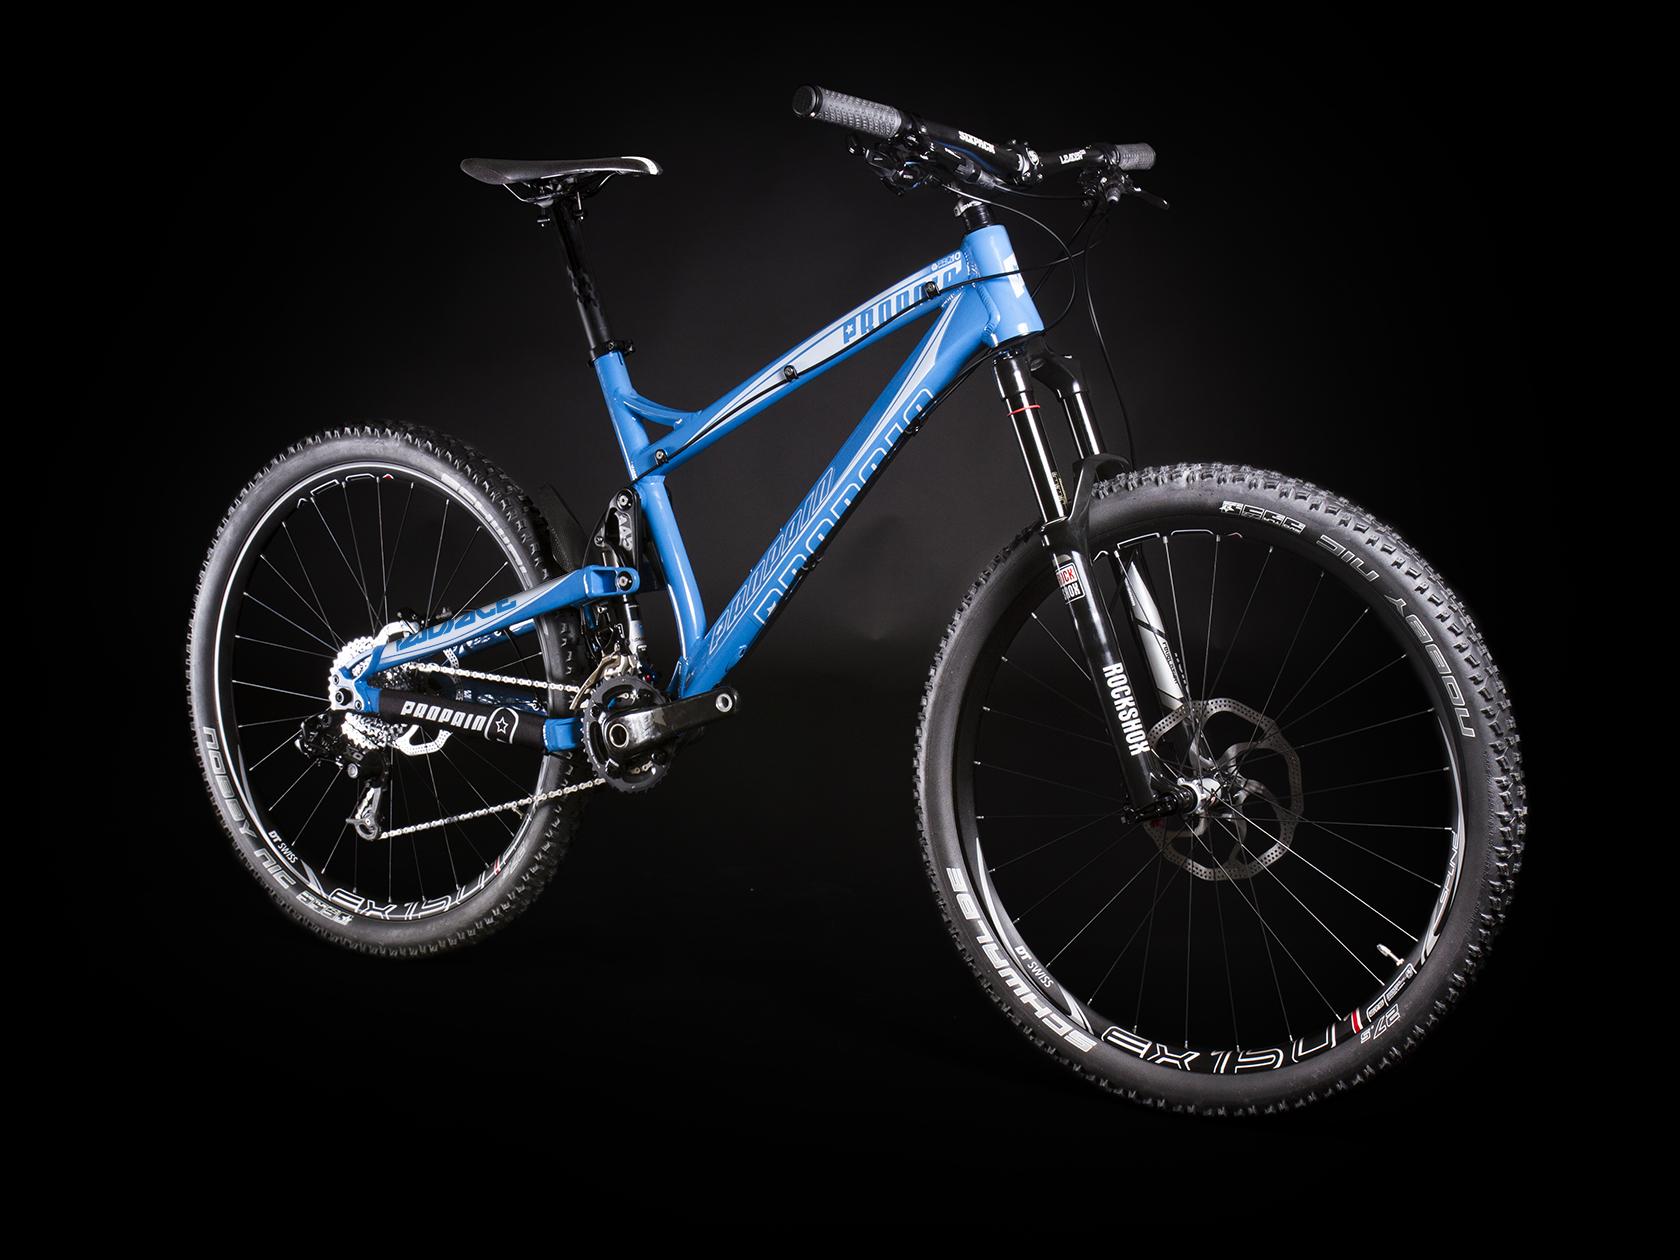 PROPAINS neues All Mountain Bike - das TWOFACE